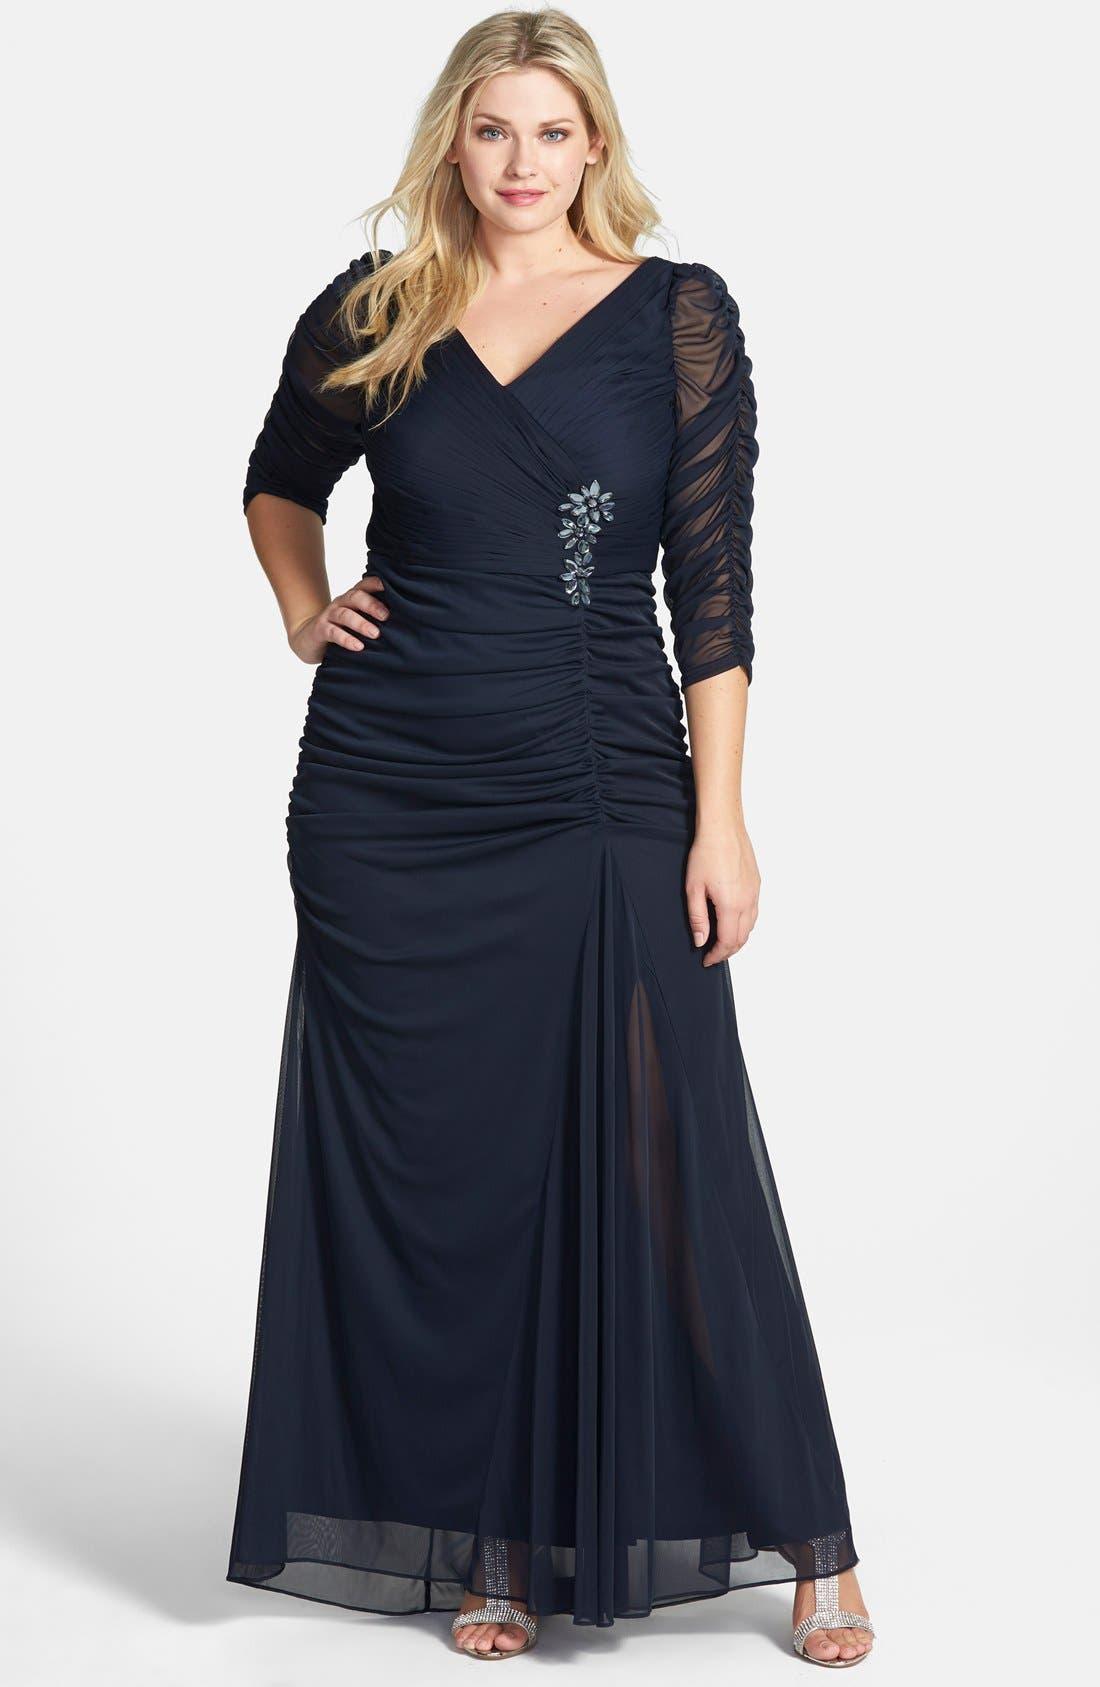 1940s Plus Size Dresses | Swing Dress, Tea Dress Plus Size Womens Adrianna Papell Beaded Mesh Gown $180.00 AT vintagedancer.com